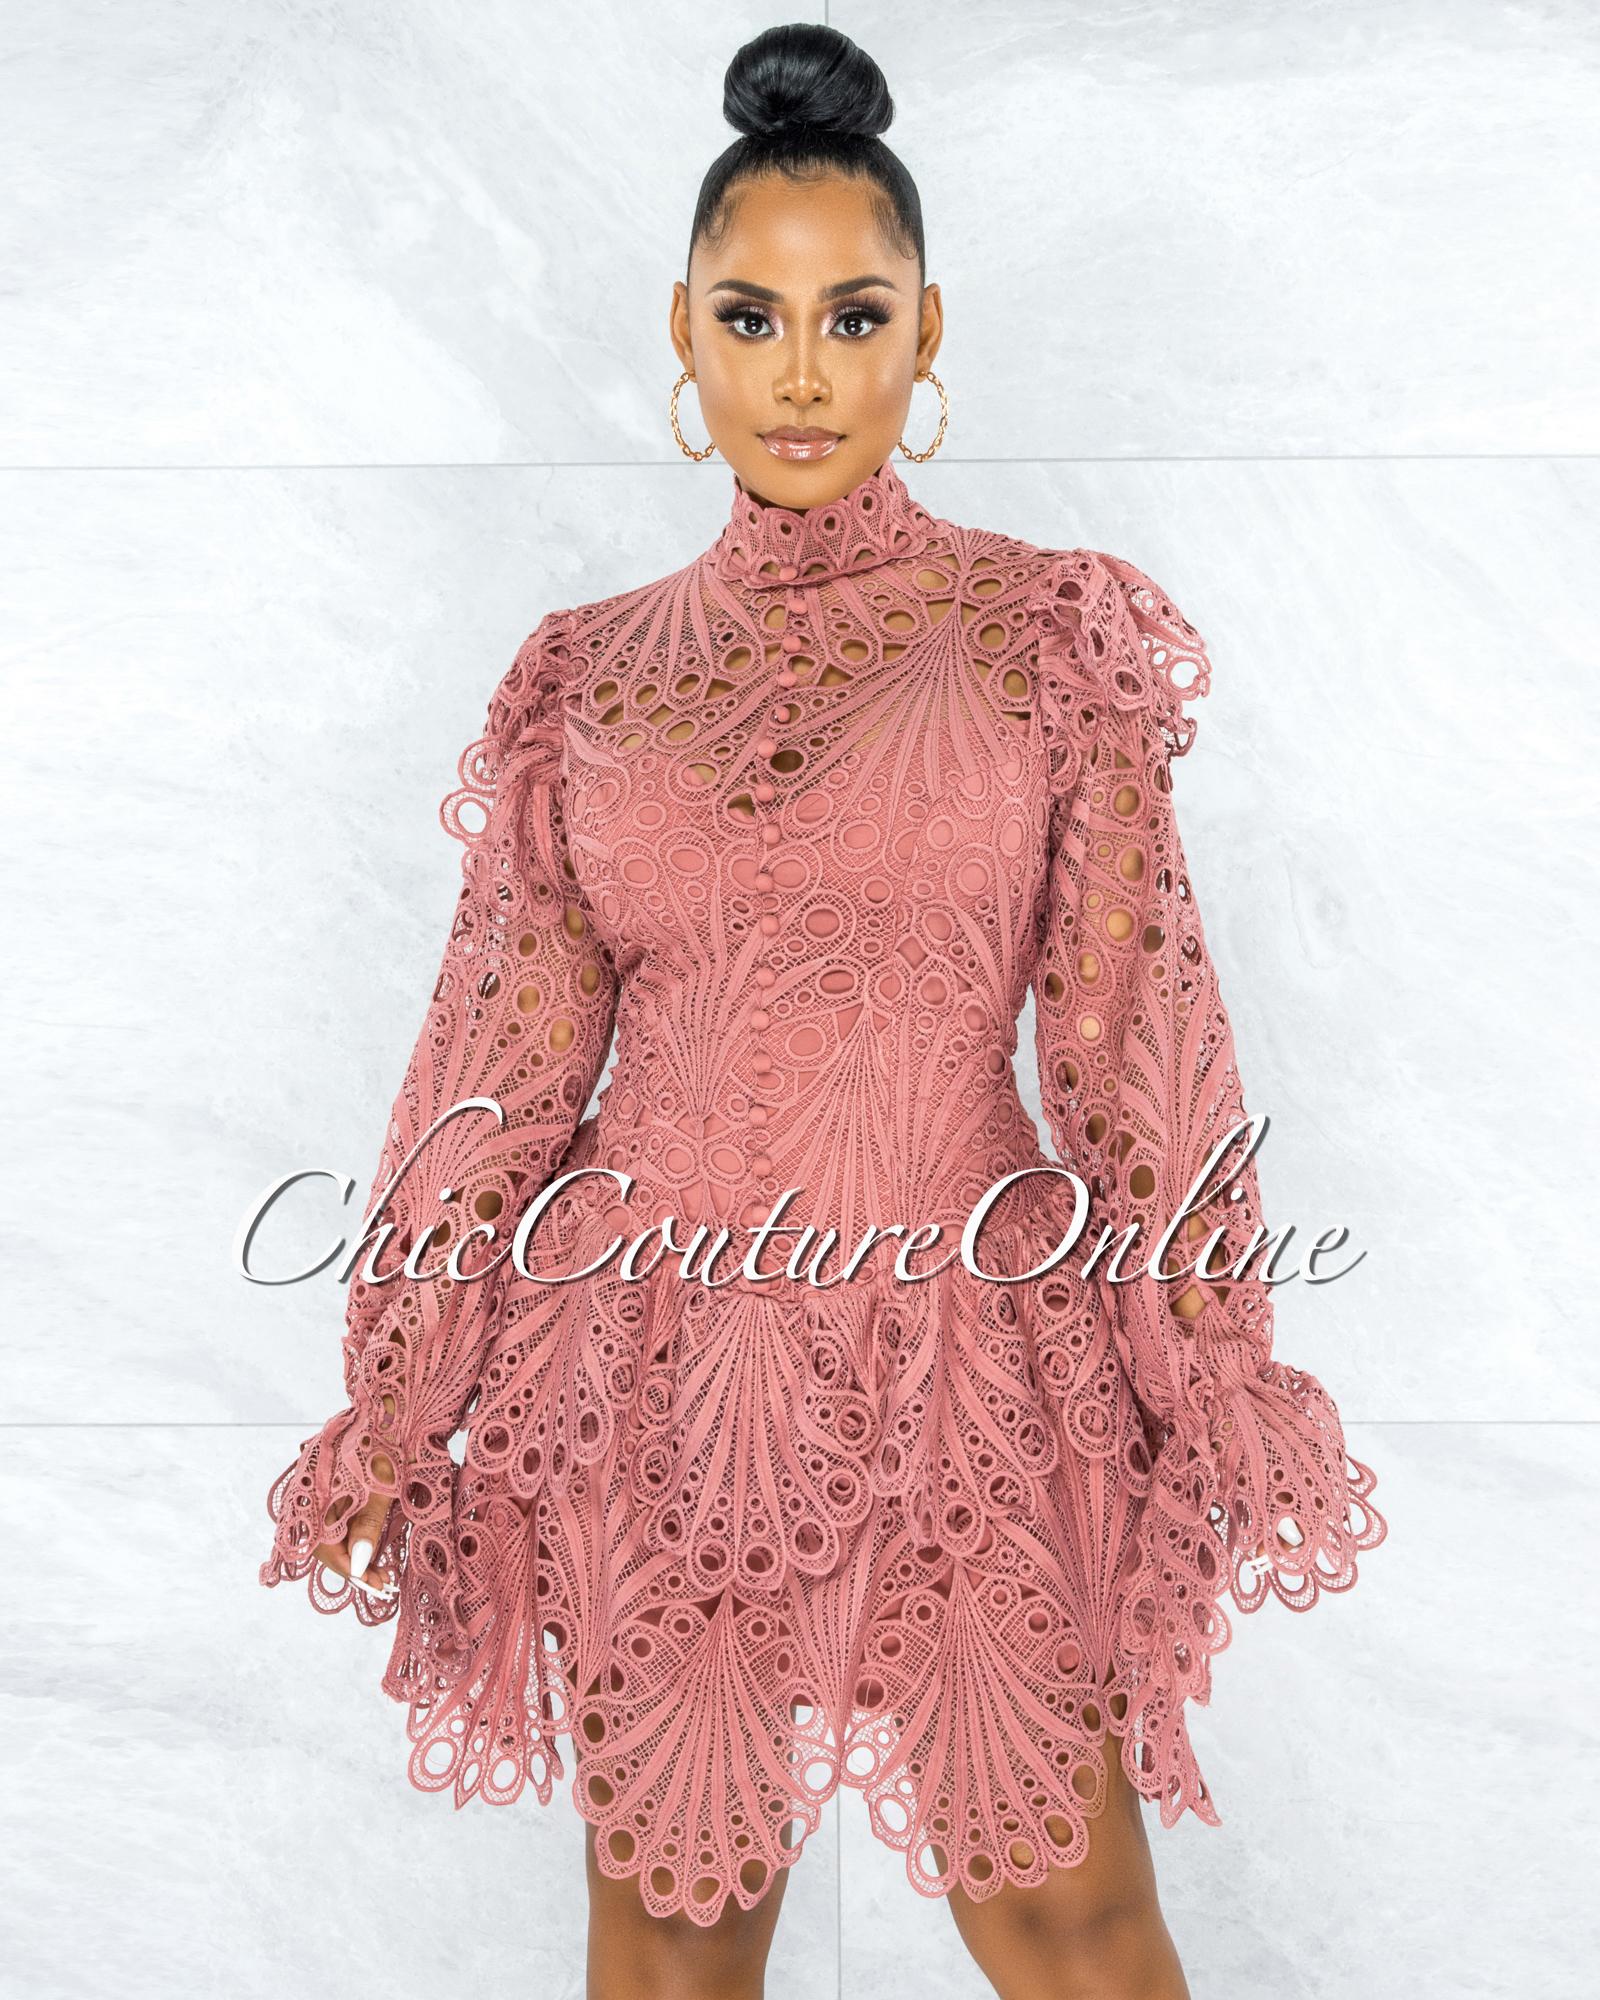 Zamora Mauve Crochet Embroidery Ruffle Skater Dress